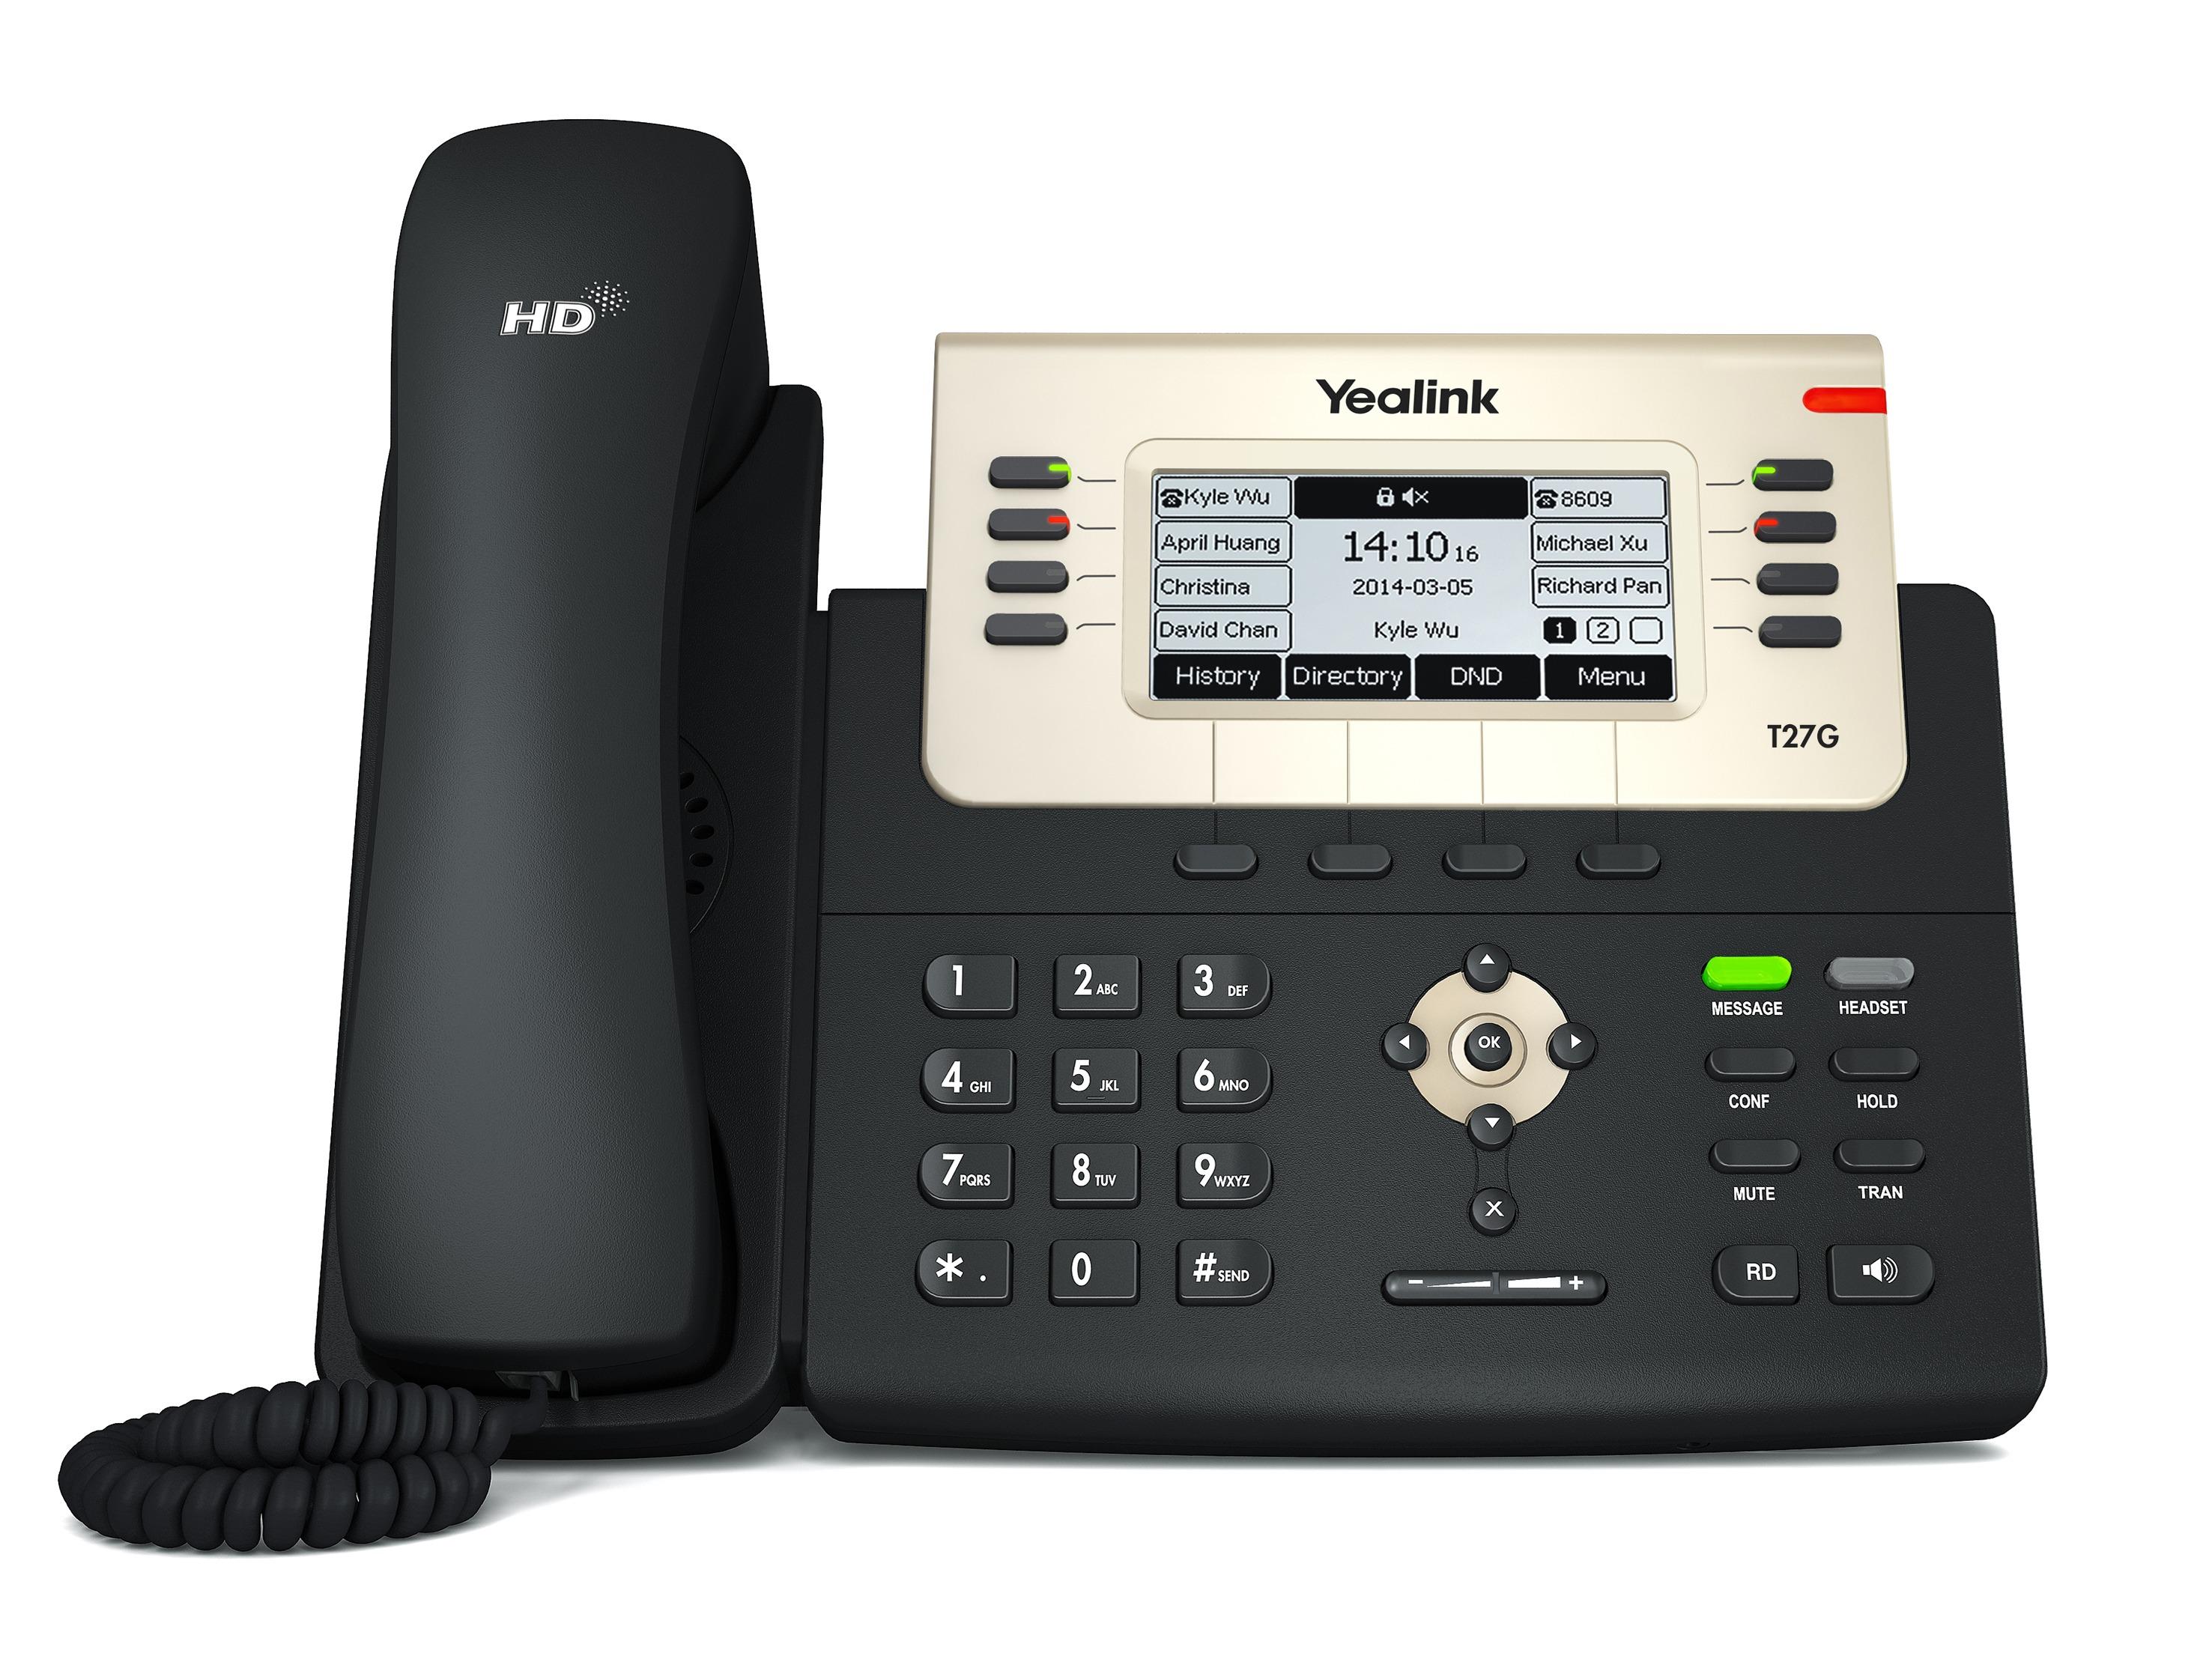 Phone Yealink T27G